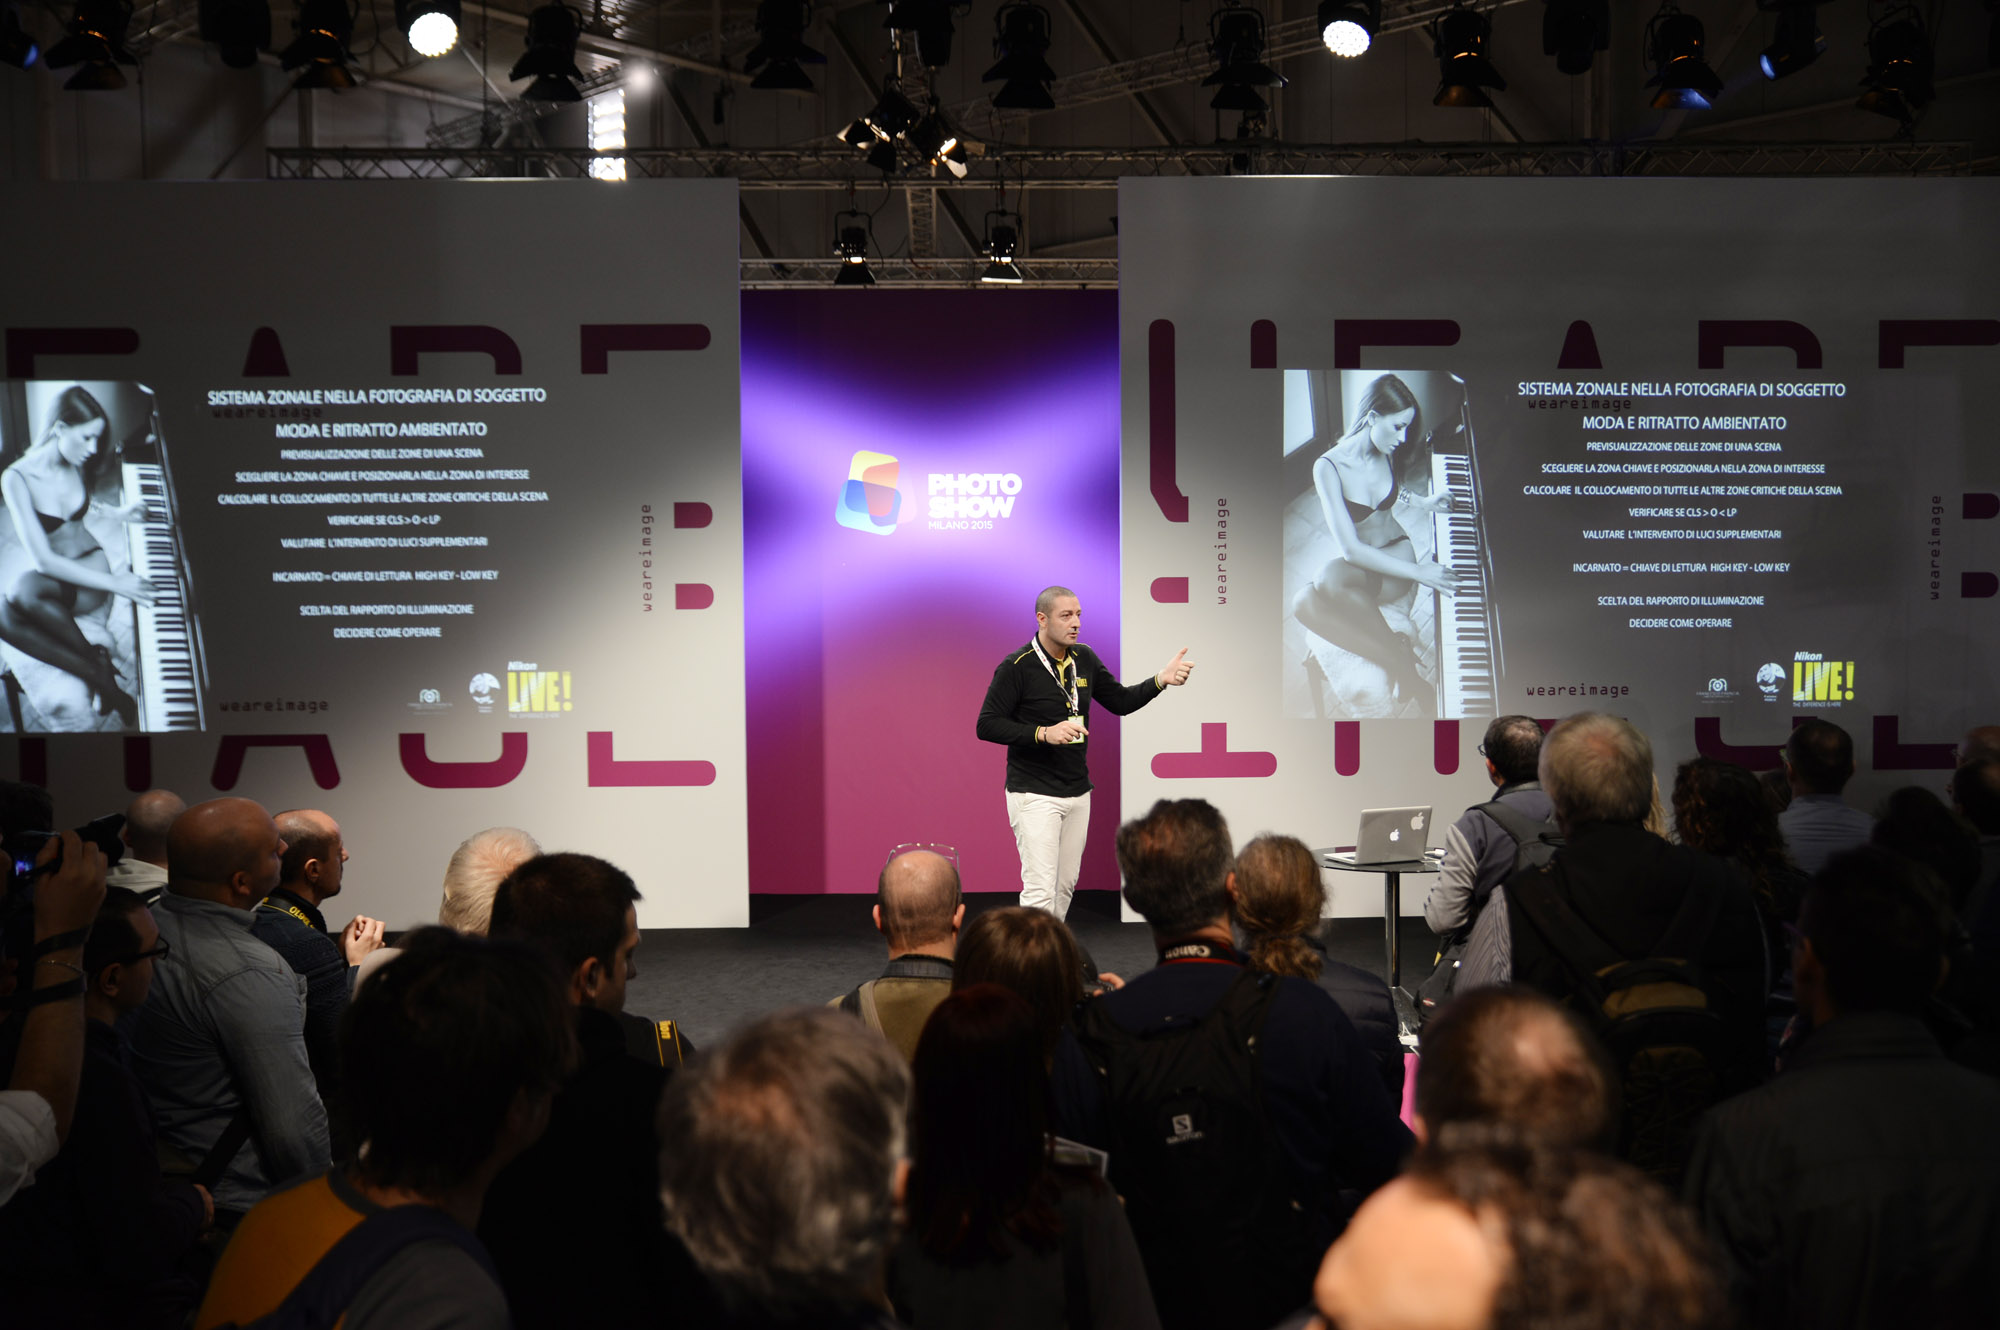 Francesco Francia master nikon school relatore al photoshow 2015 Milano domenica 25 ottobre 2015 - PLACO FASHION